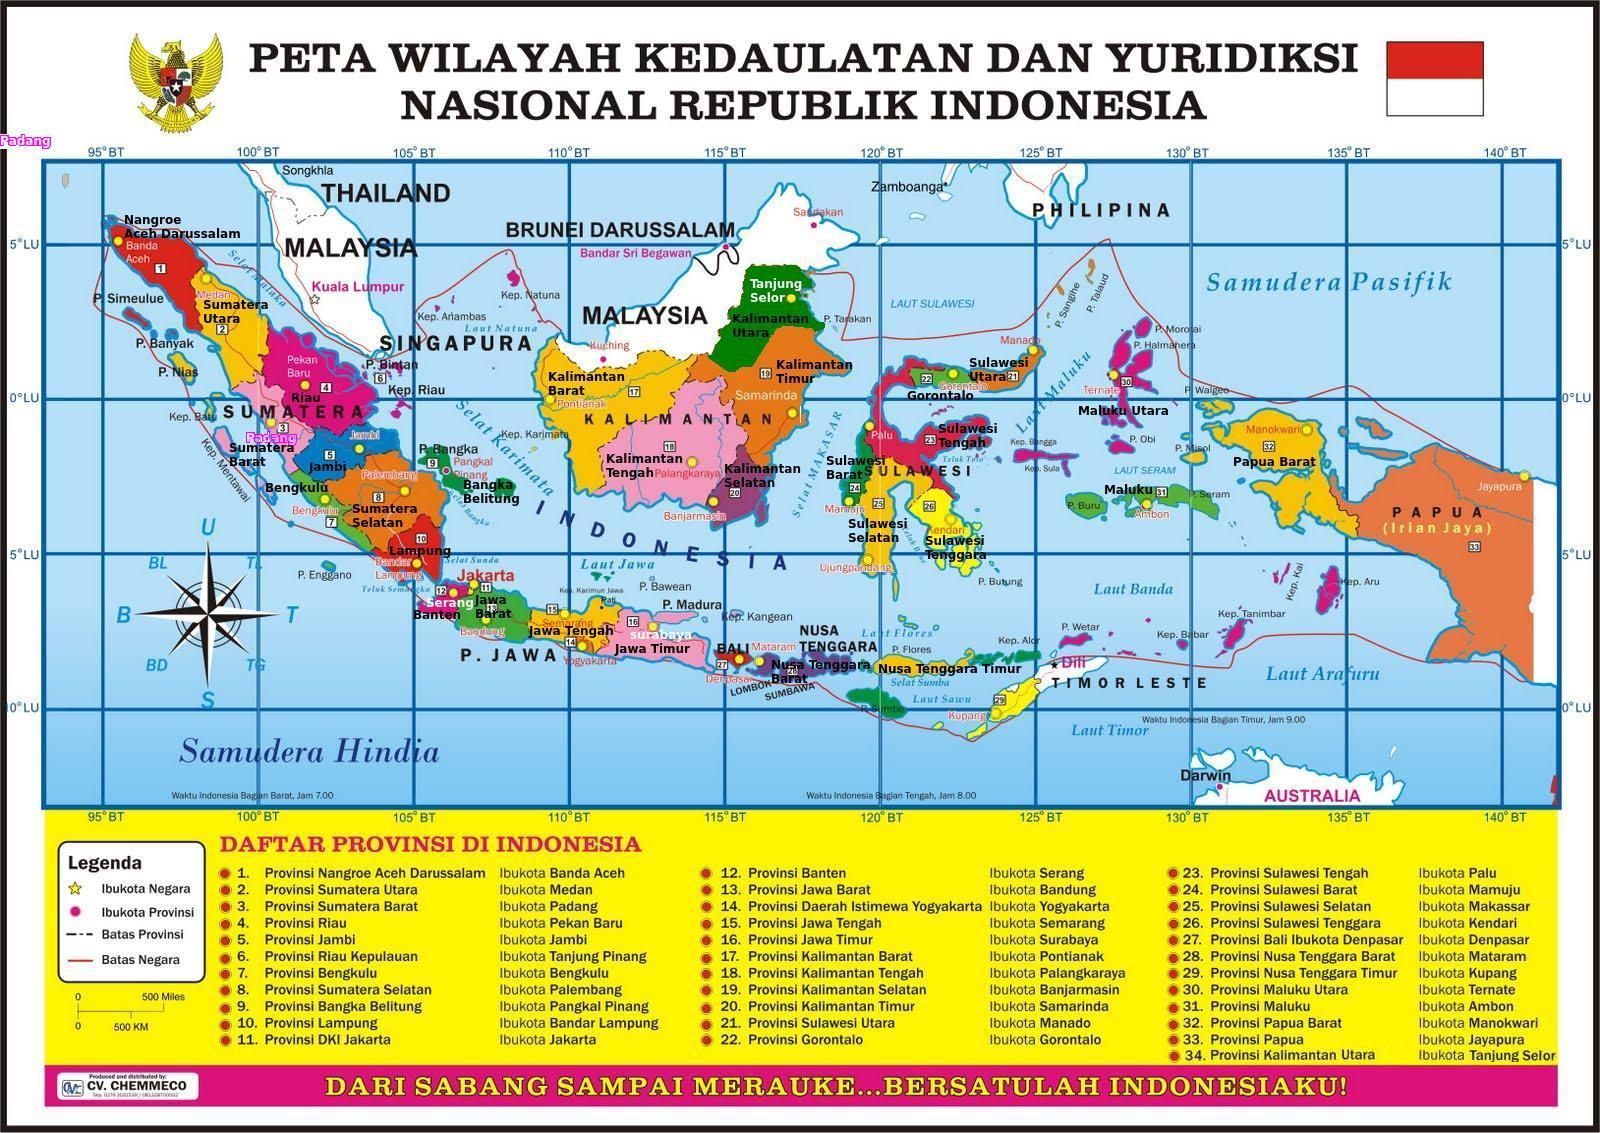 Macam macam legenda atau simbol dari peta. Gambar Peta Indonesia Lengkap Dengan Legenda